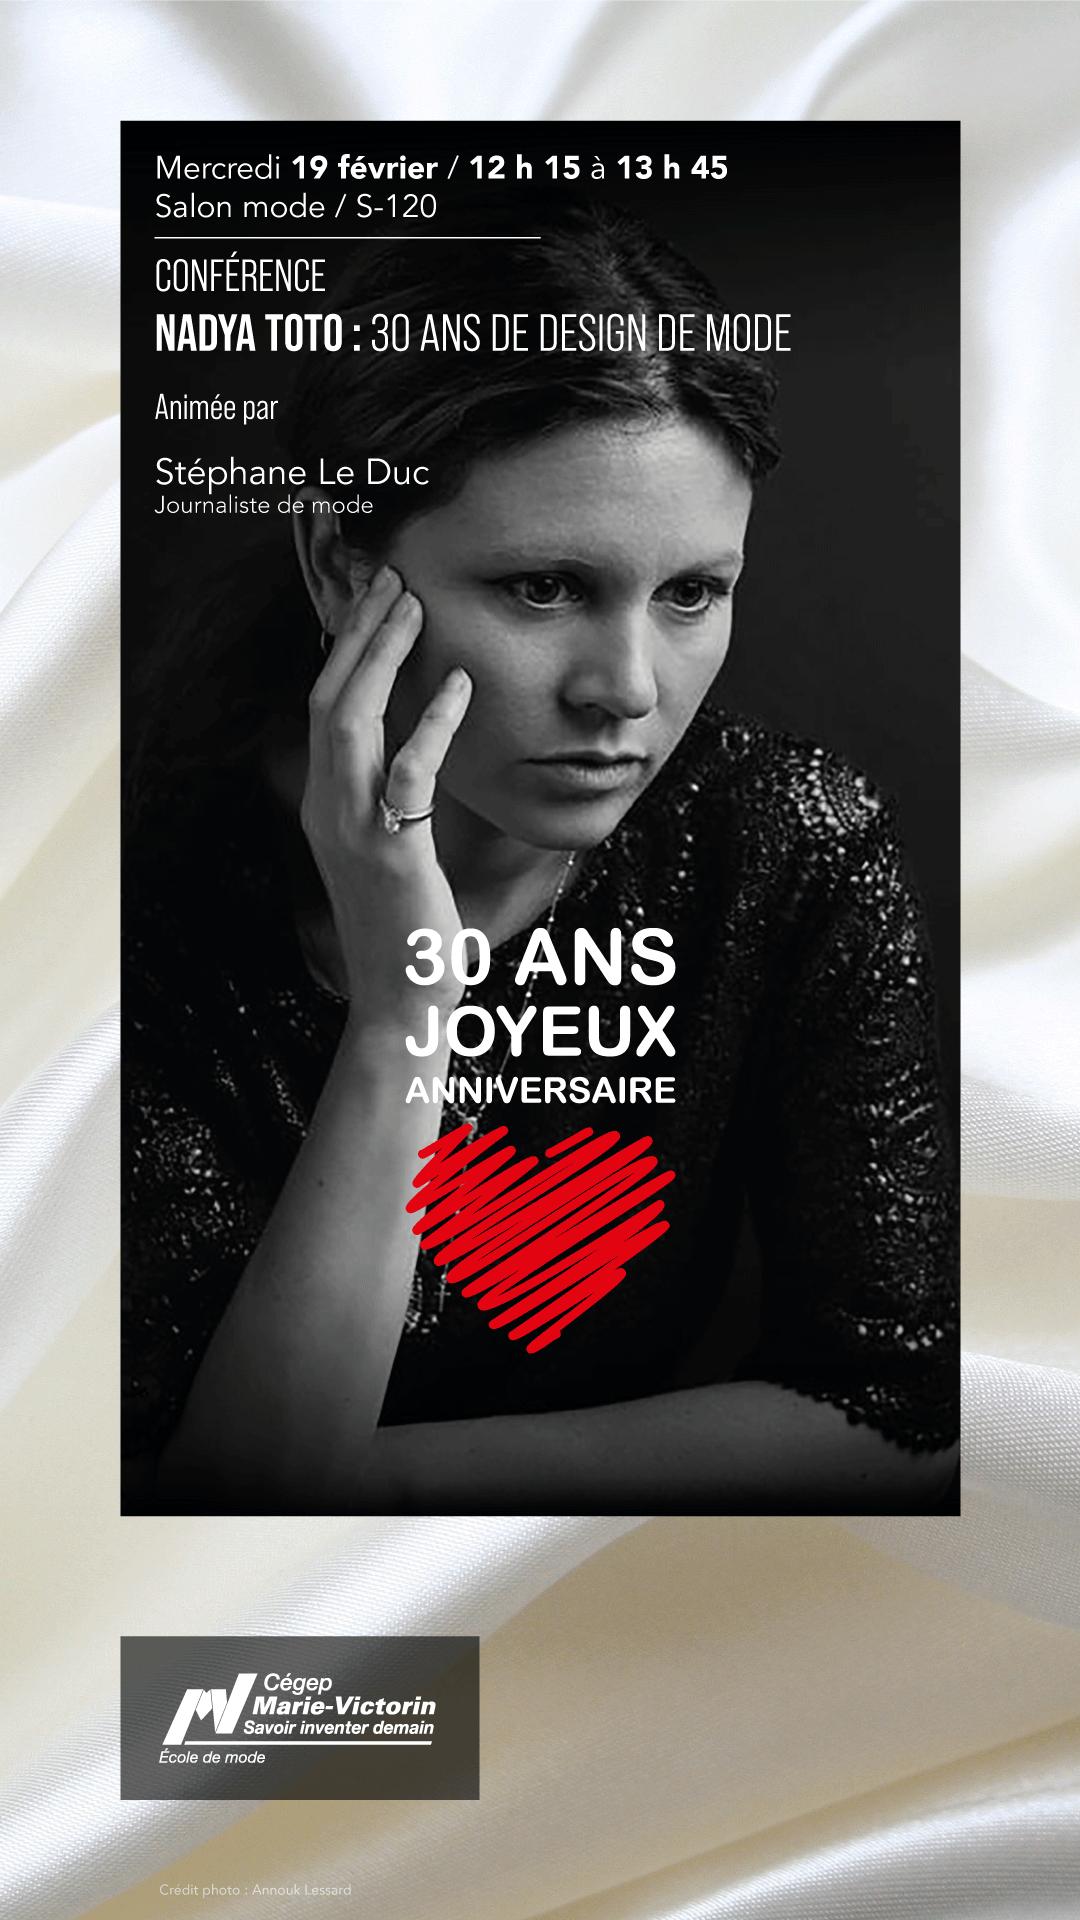 Nadya Toto : 30 années de design de mode